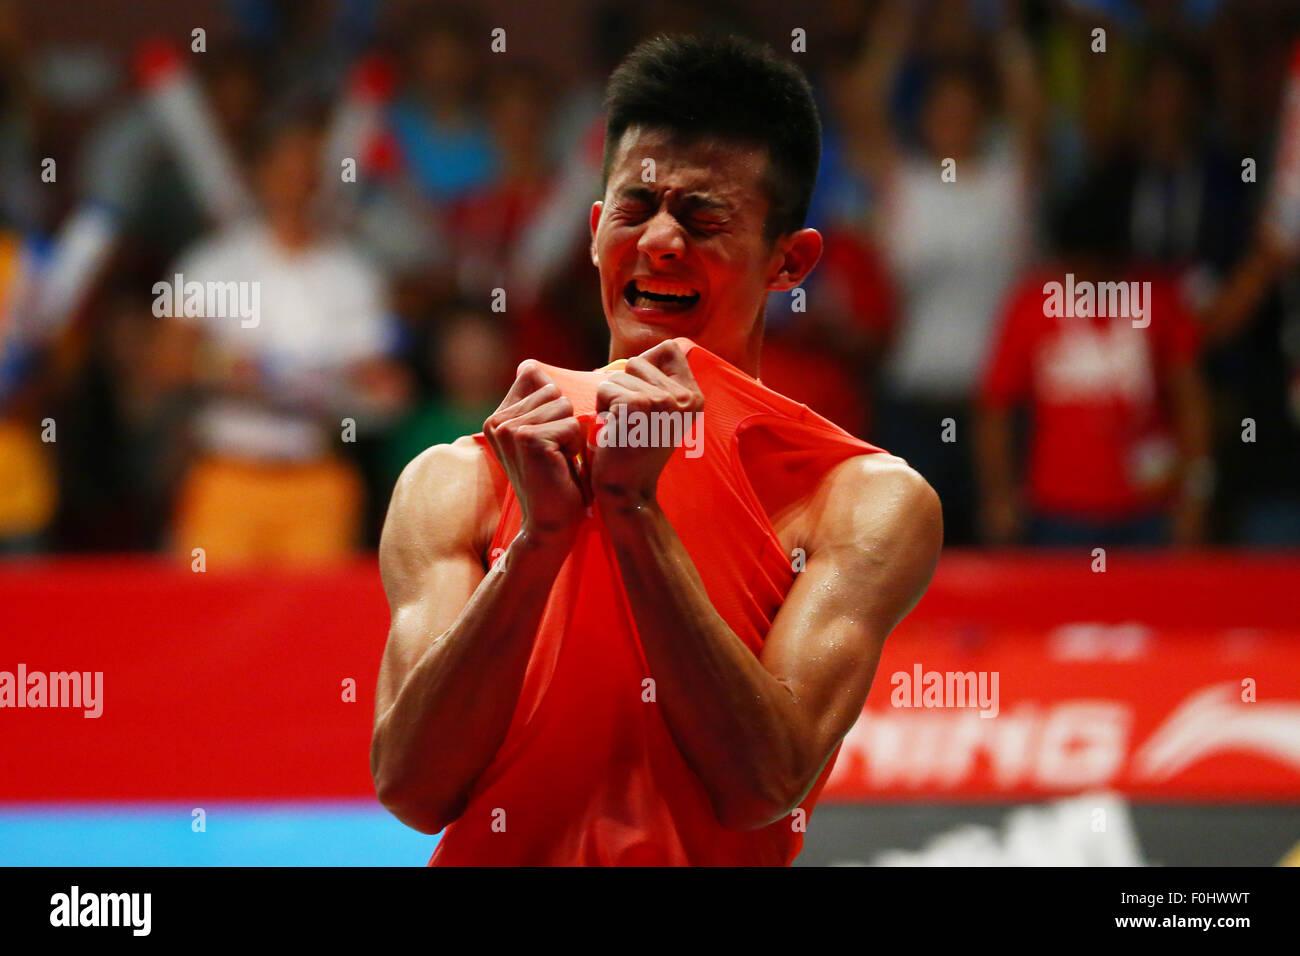 Istora Senayan Arena, Jakarta, Indonesien. 16. August 2015. Chen Long (CHN), 16. August 2015 - Badminton: TOTAL Stockbild